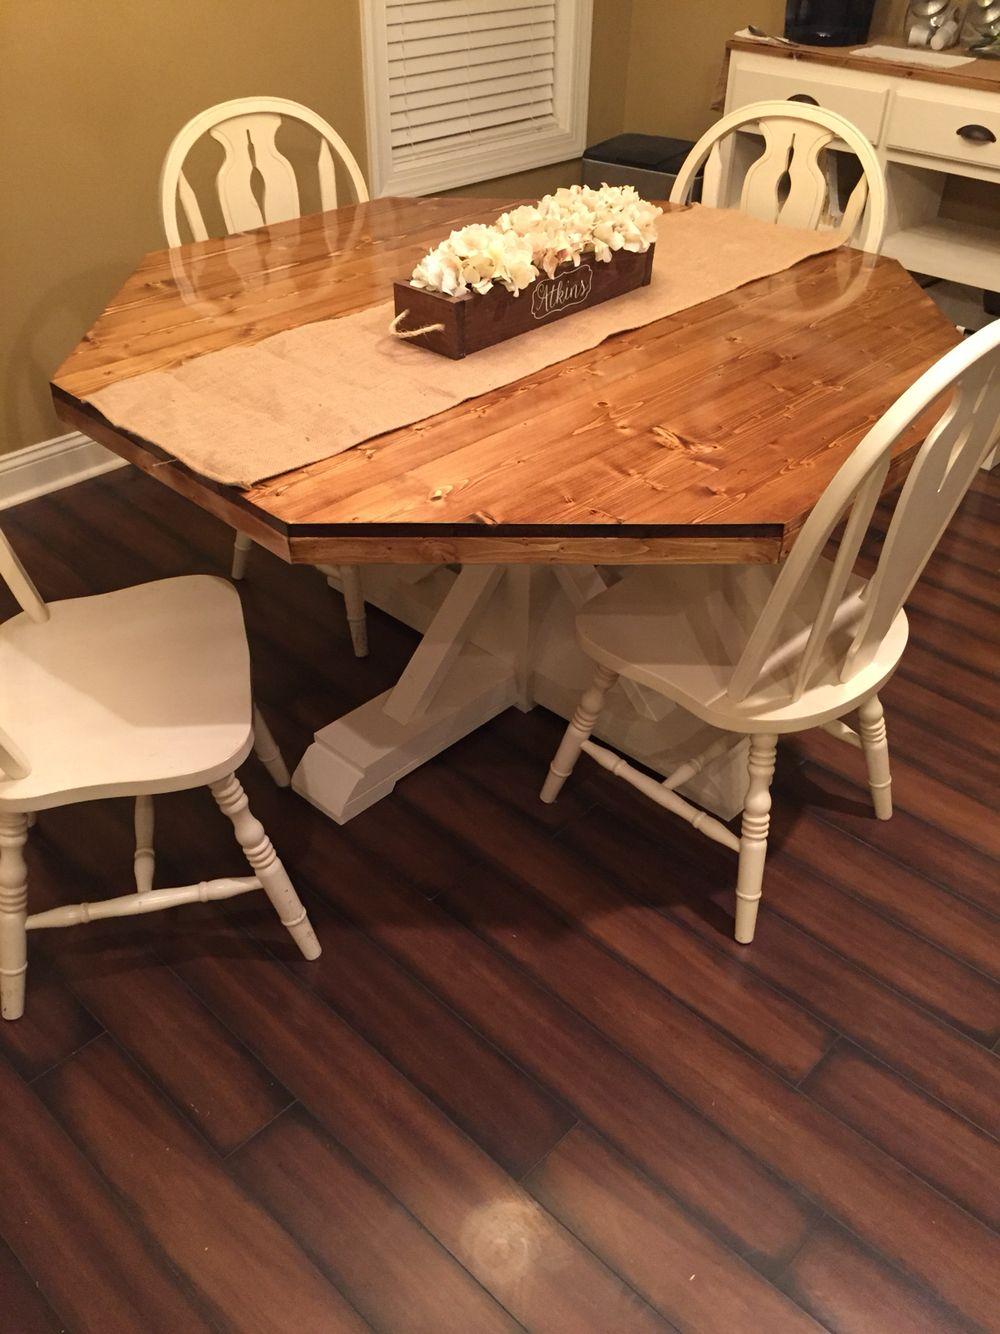 Rustic Octagon Table Octagon Table Kitchen Decor Banquette Diy